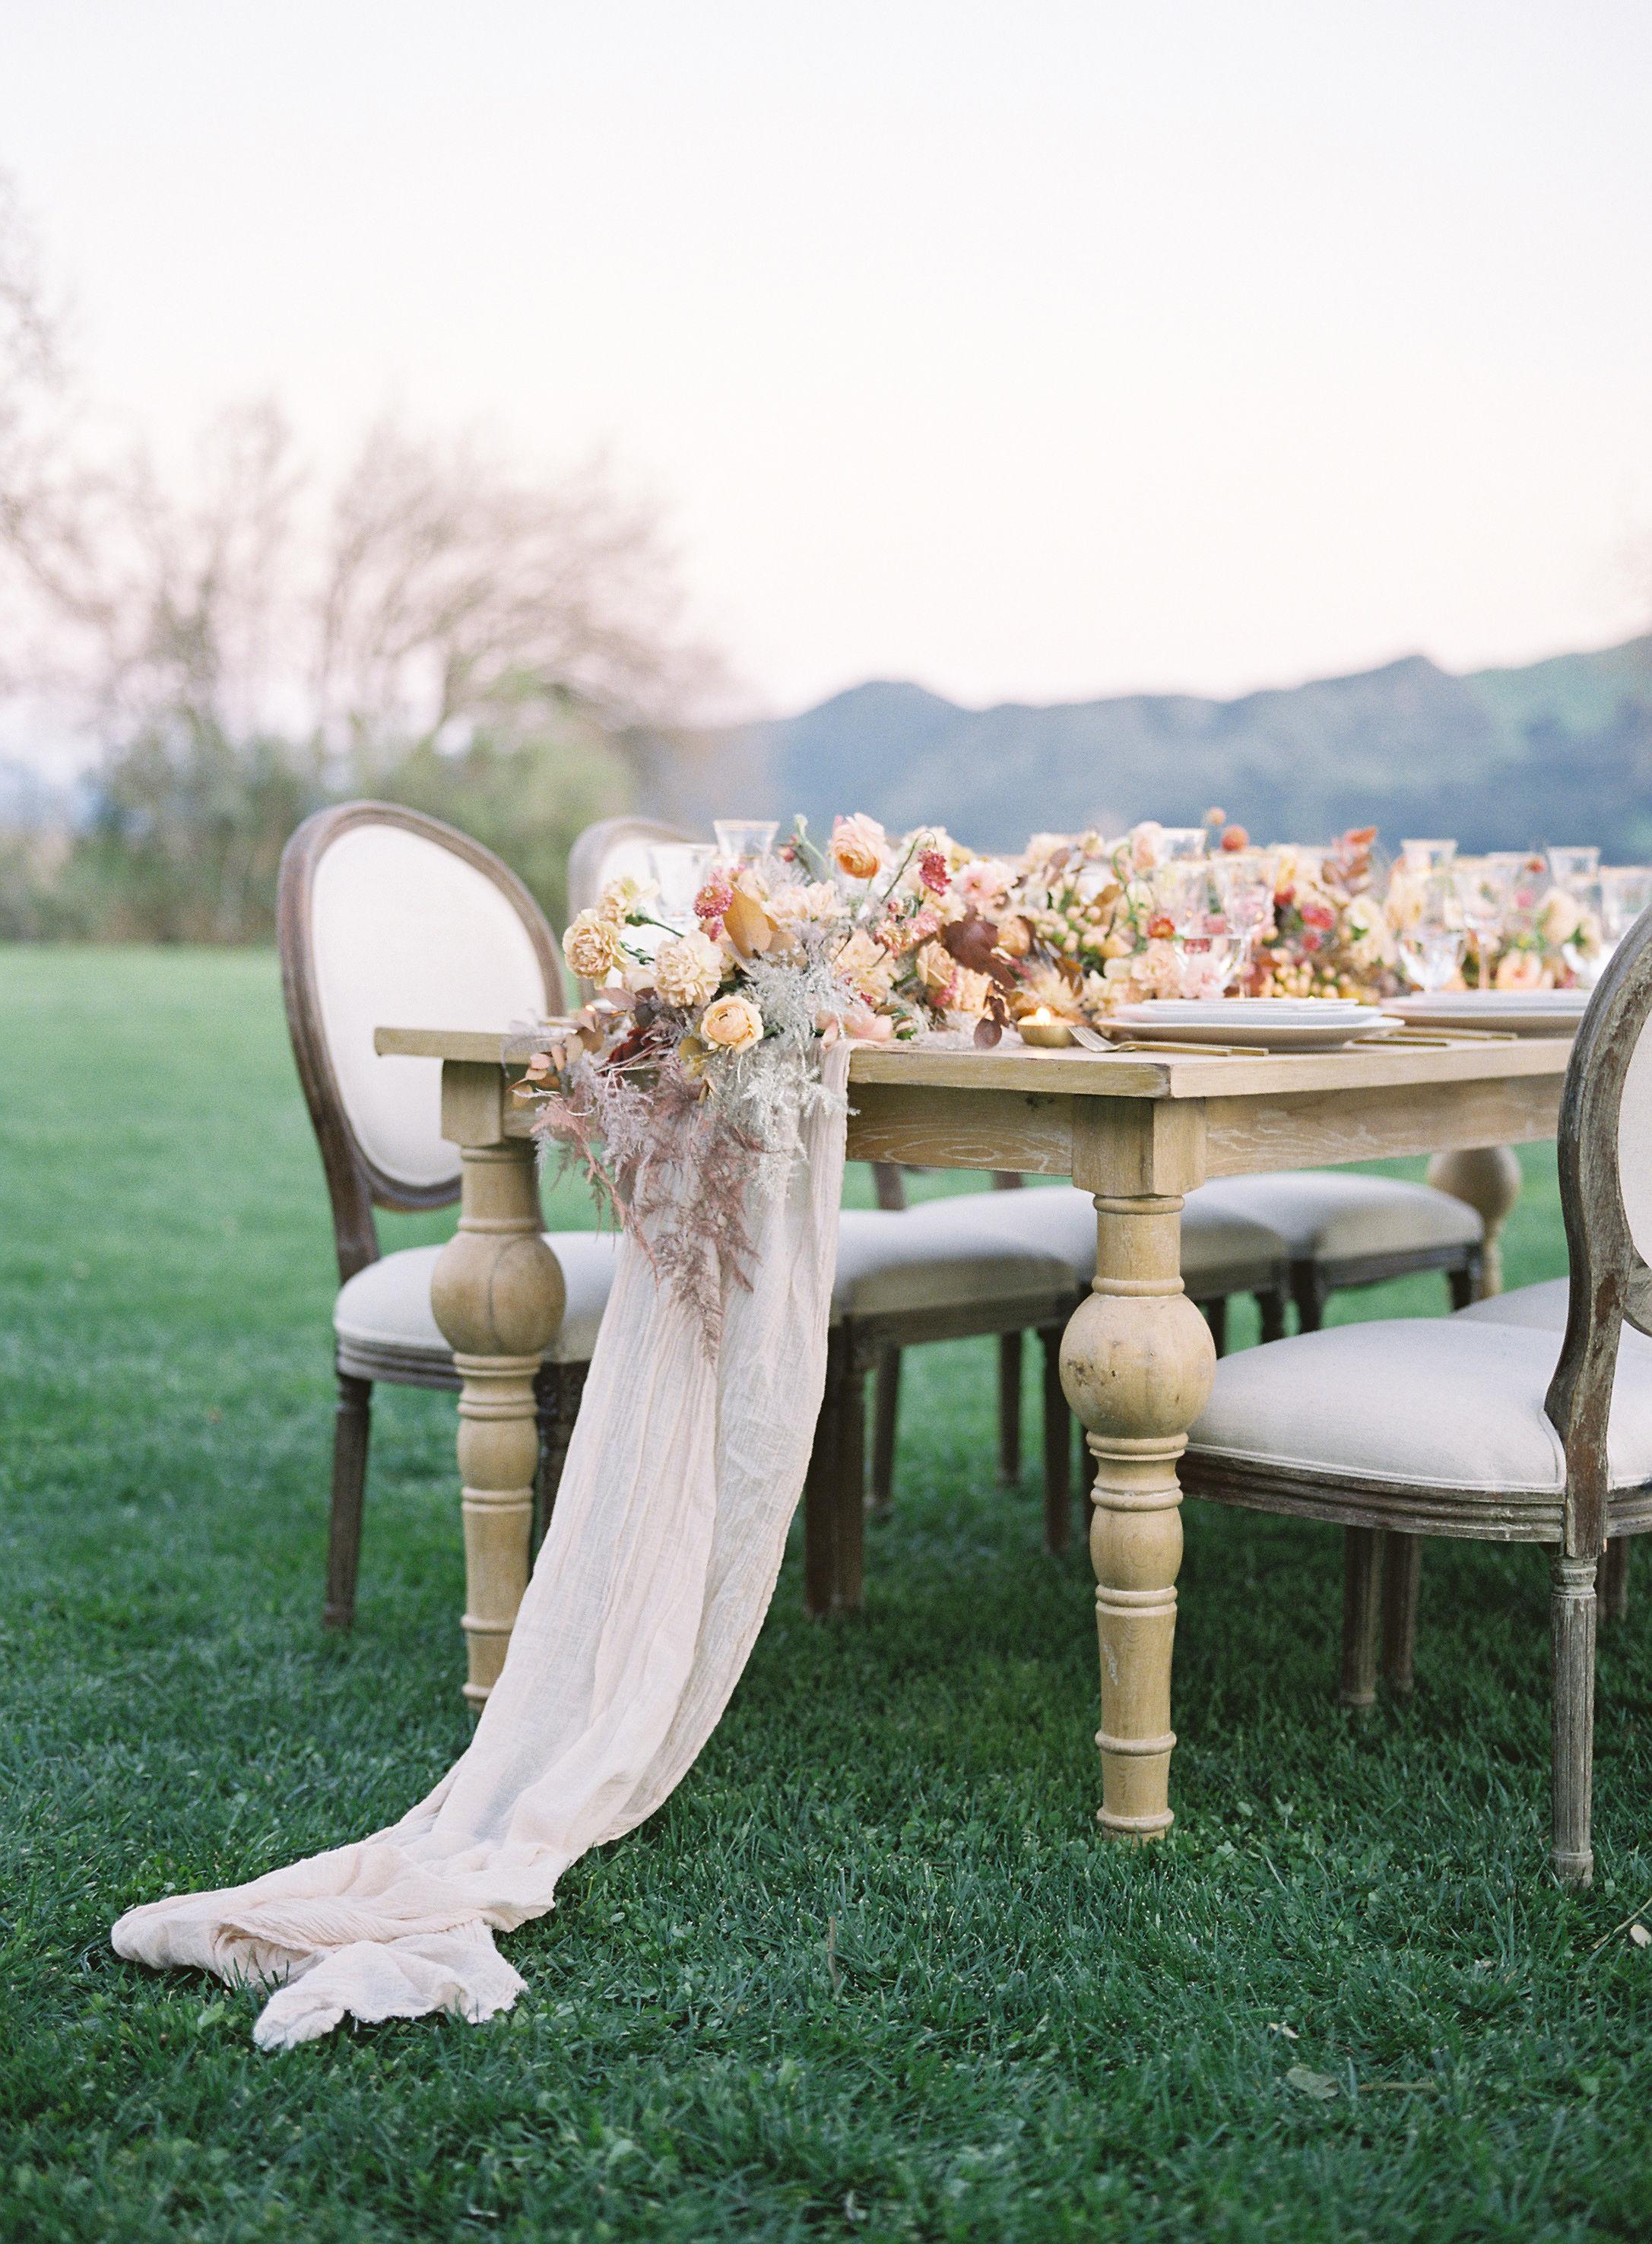 jessica-zimmerman-events-sunstone-reception-linen-table-arrangement.jpg